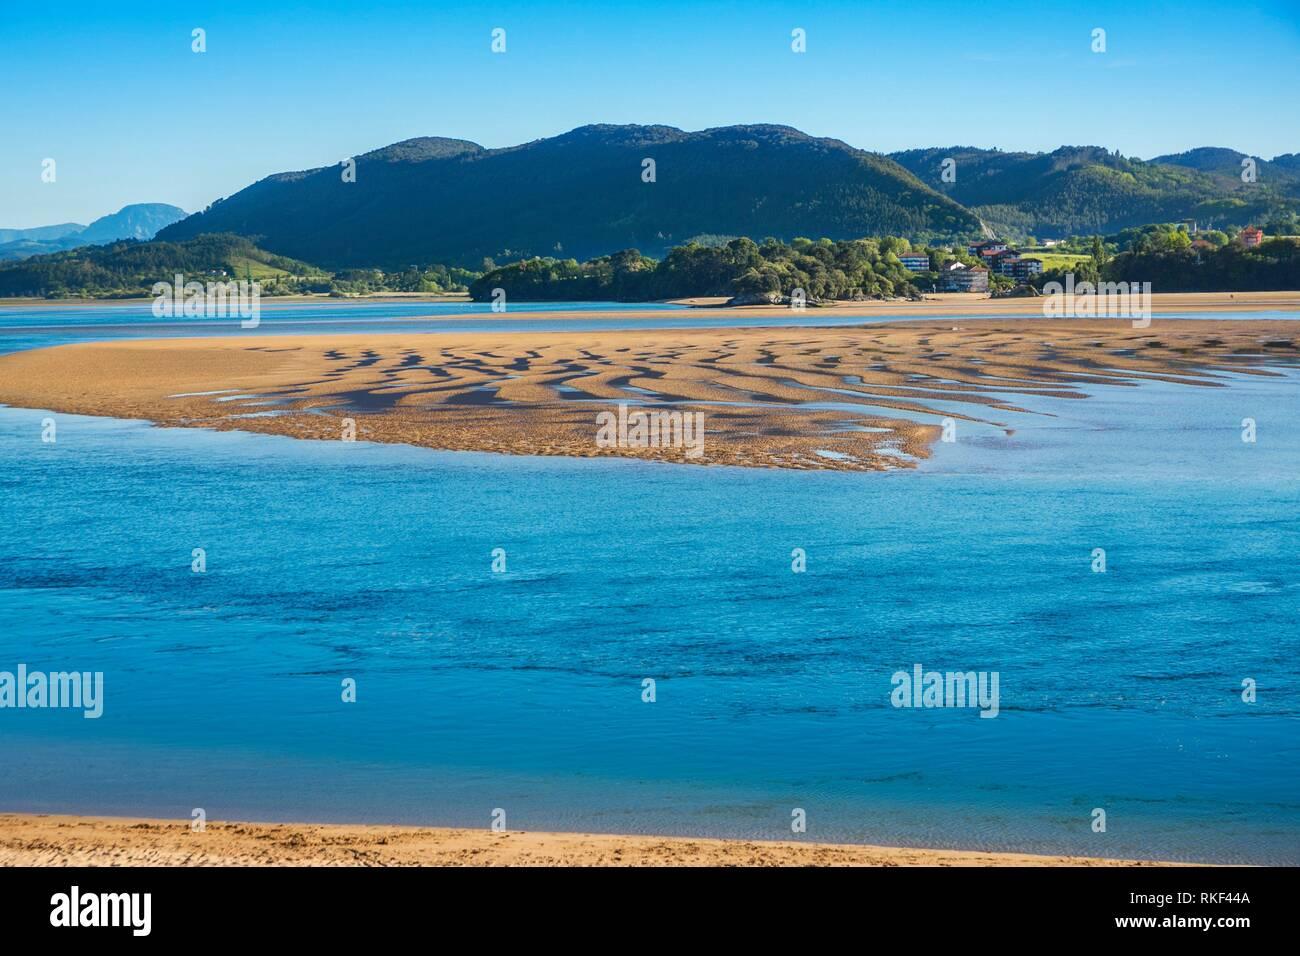 Laida Beach. Urdaibai biosphere reserve. Urdaibai Region. Bizkaia. Basque Country. Spain. - Stock Image